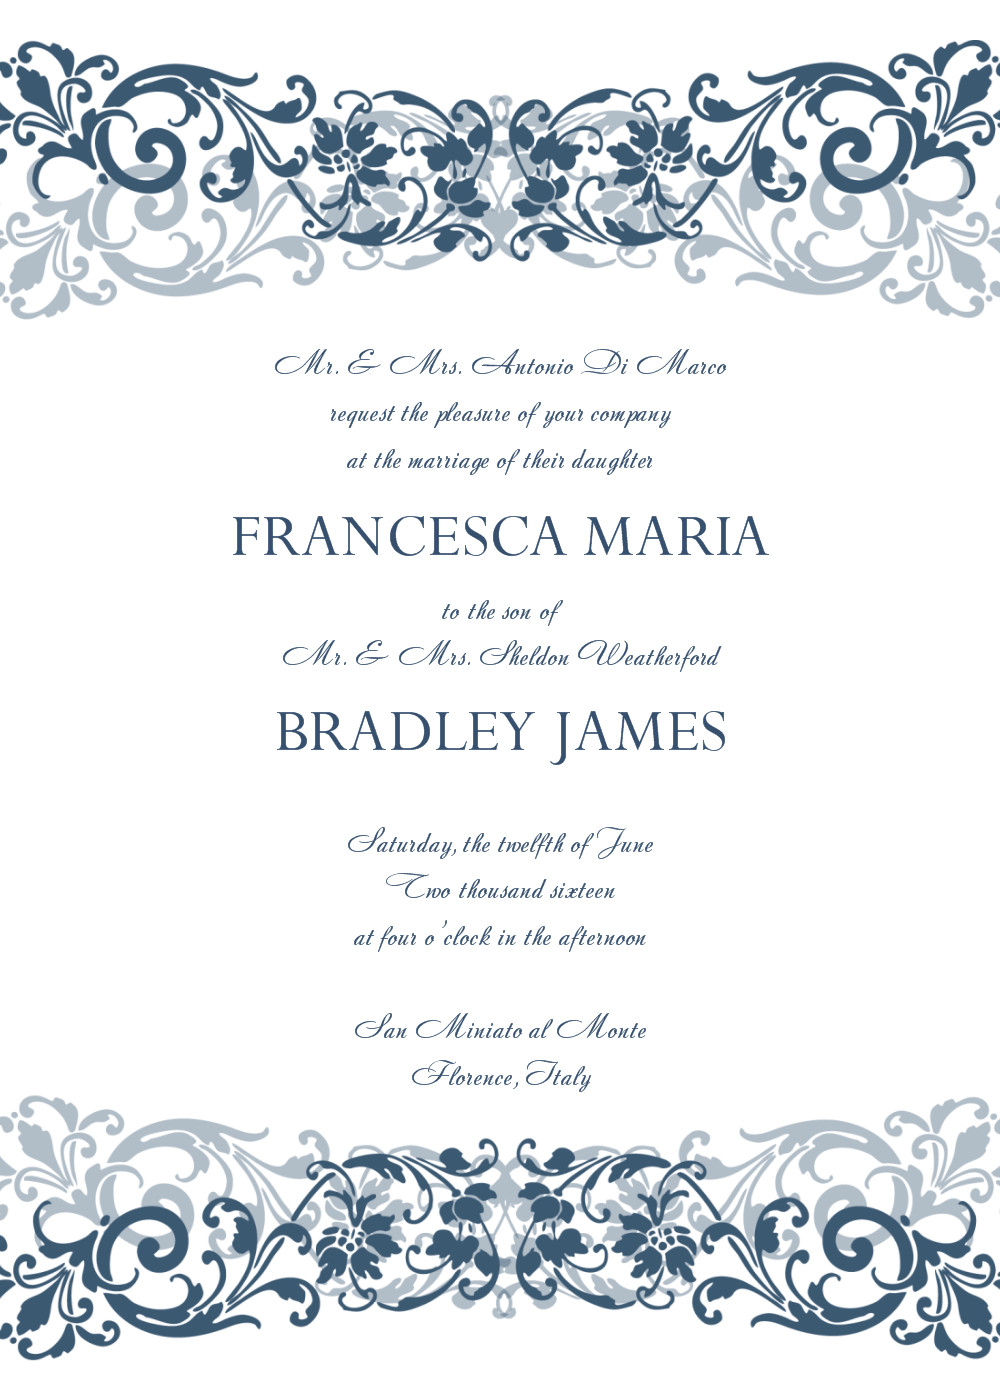 Free Printable Invitation Templates 8 Free Wedding Invitation Templates Excel Pdf formats